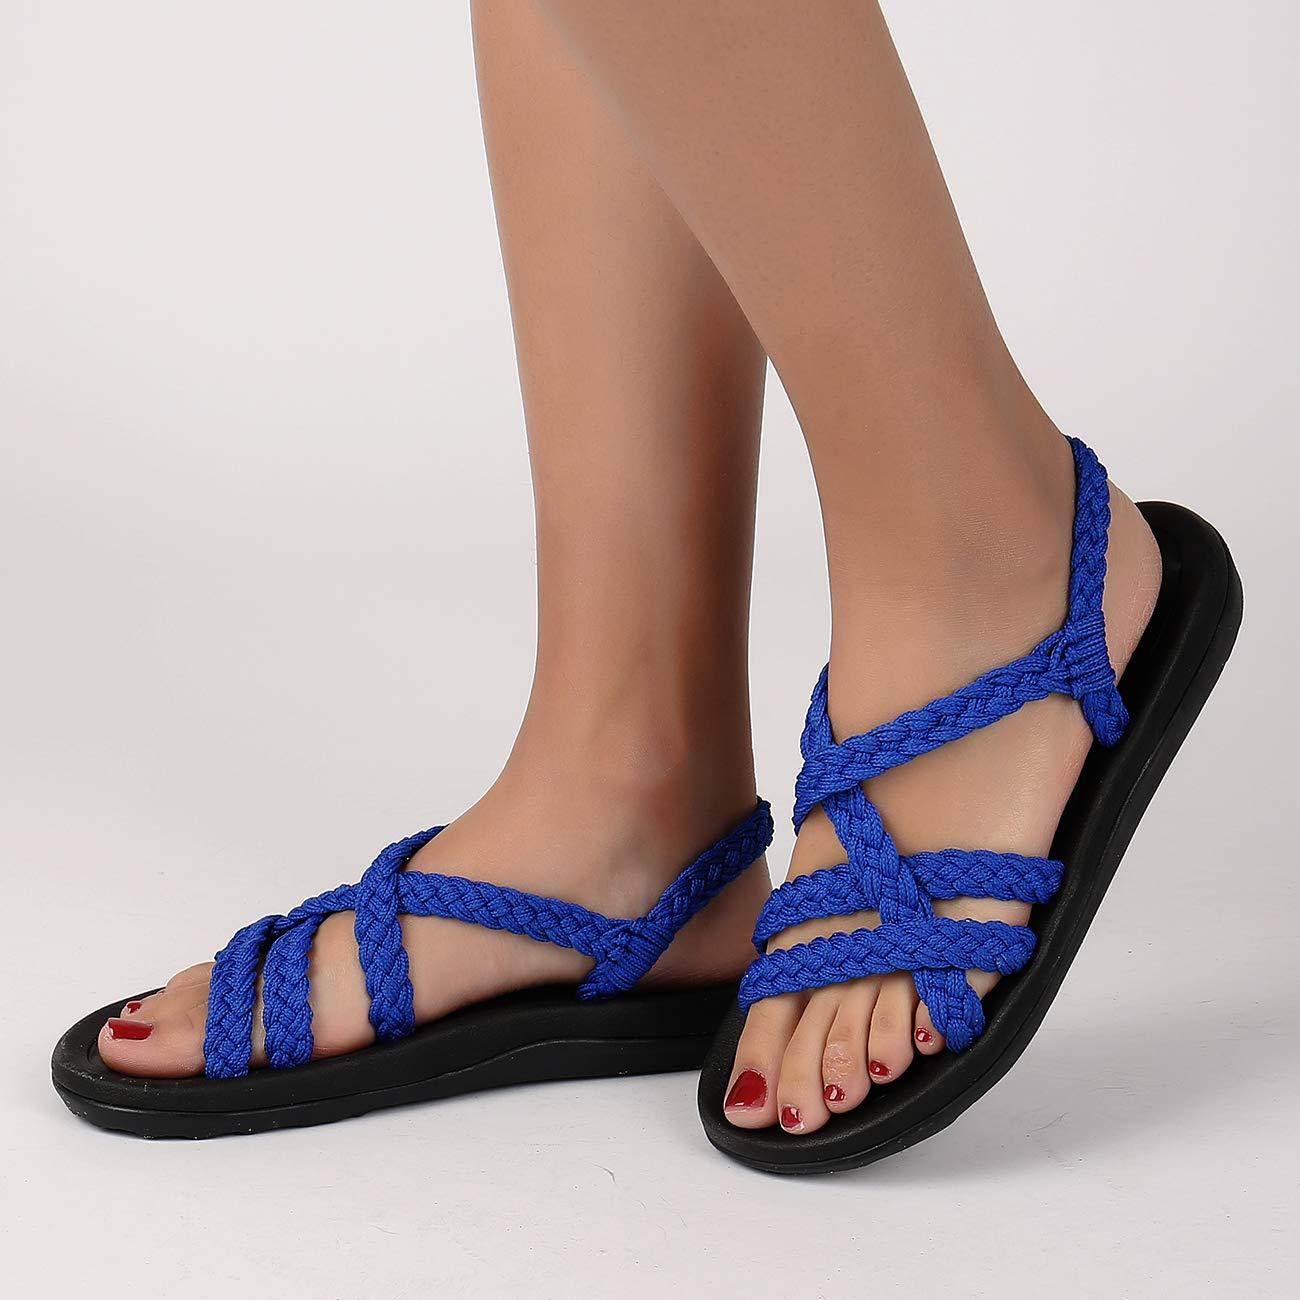 Comfortable Flat Walking Sandals